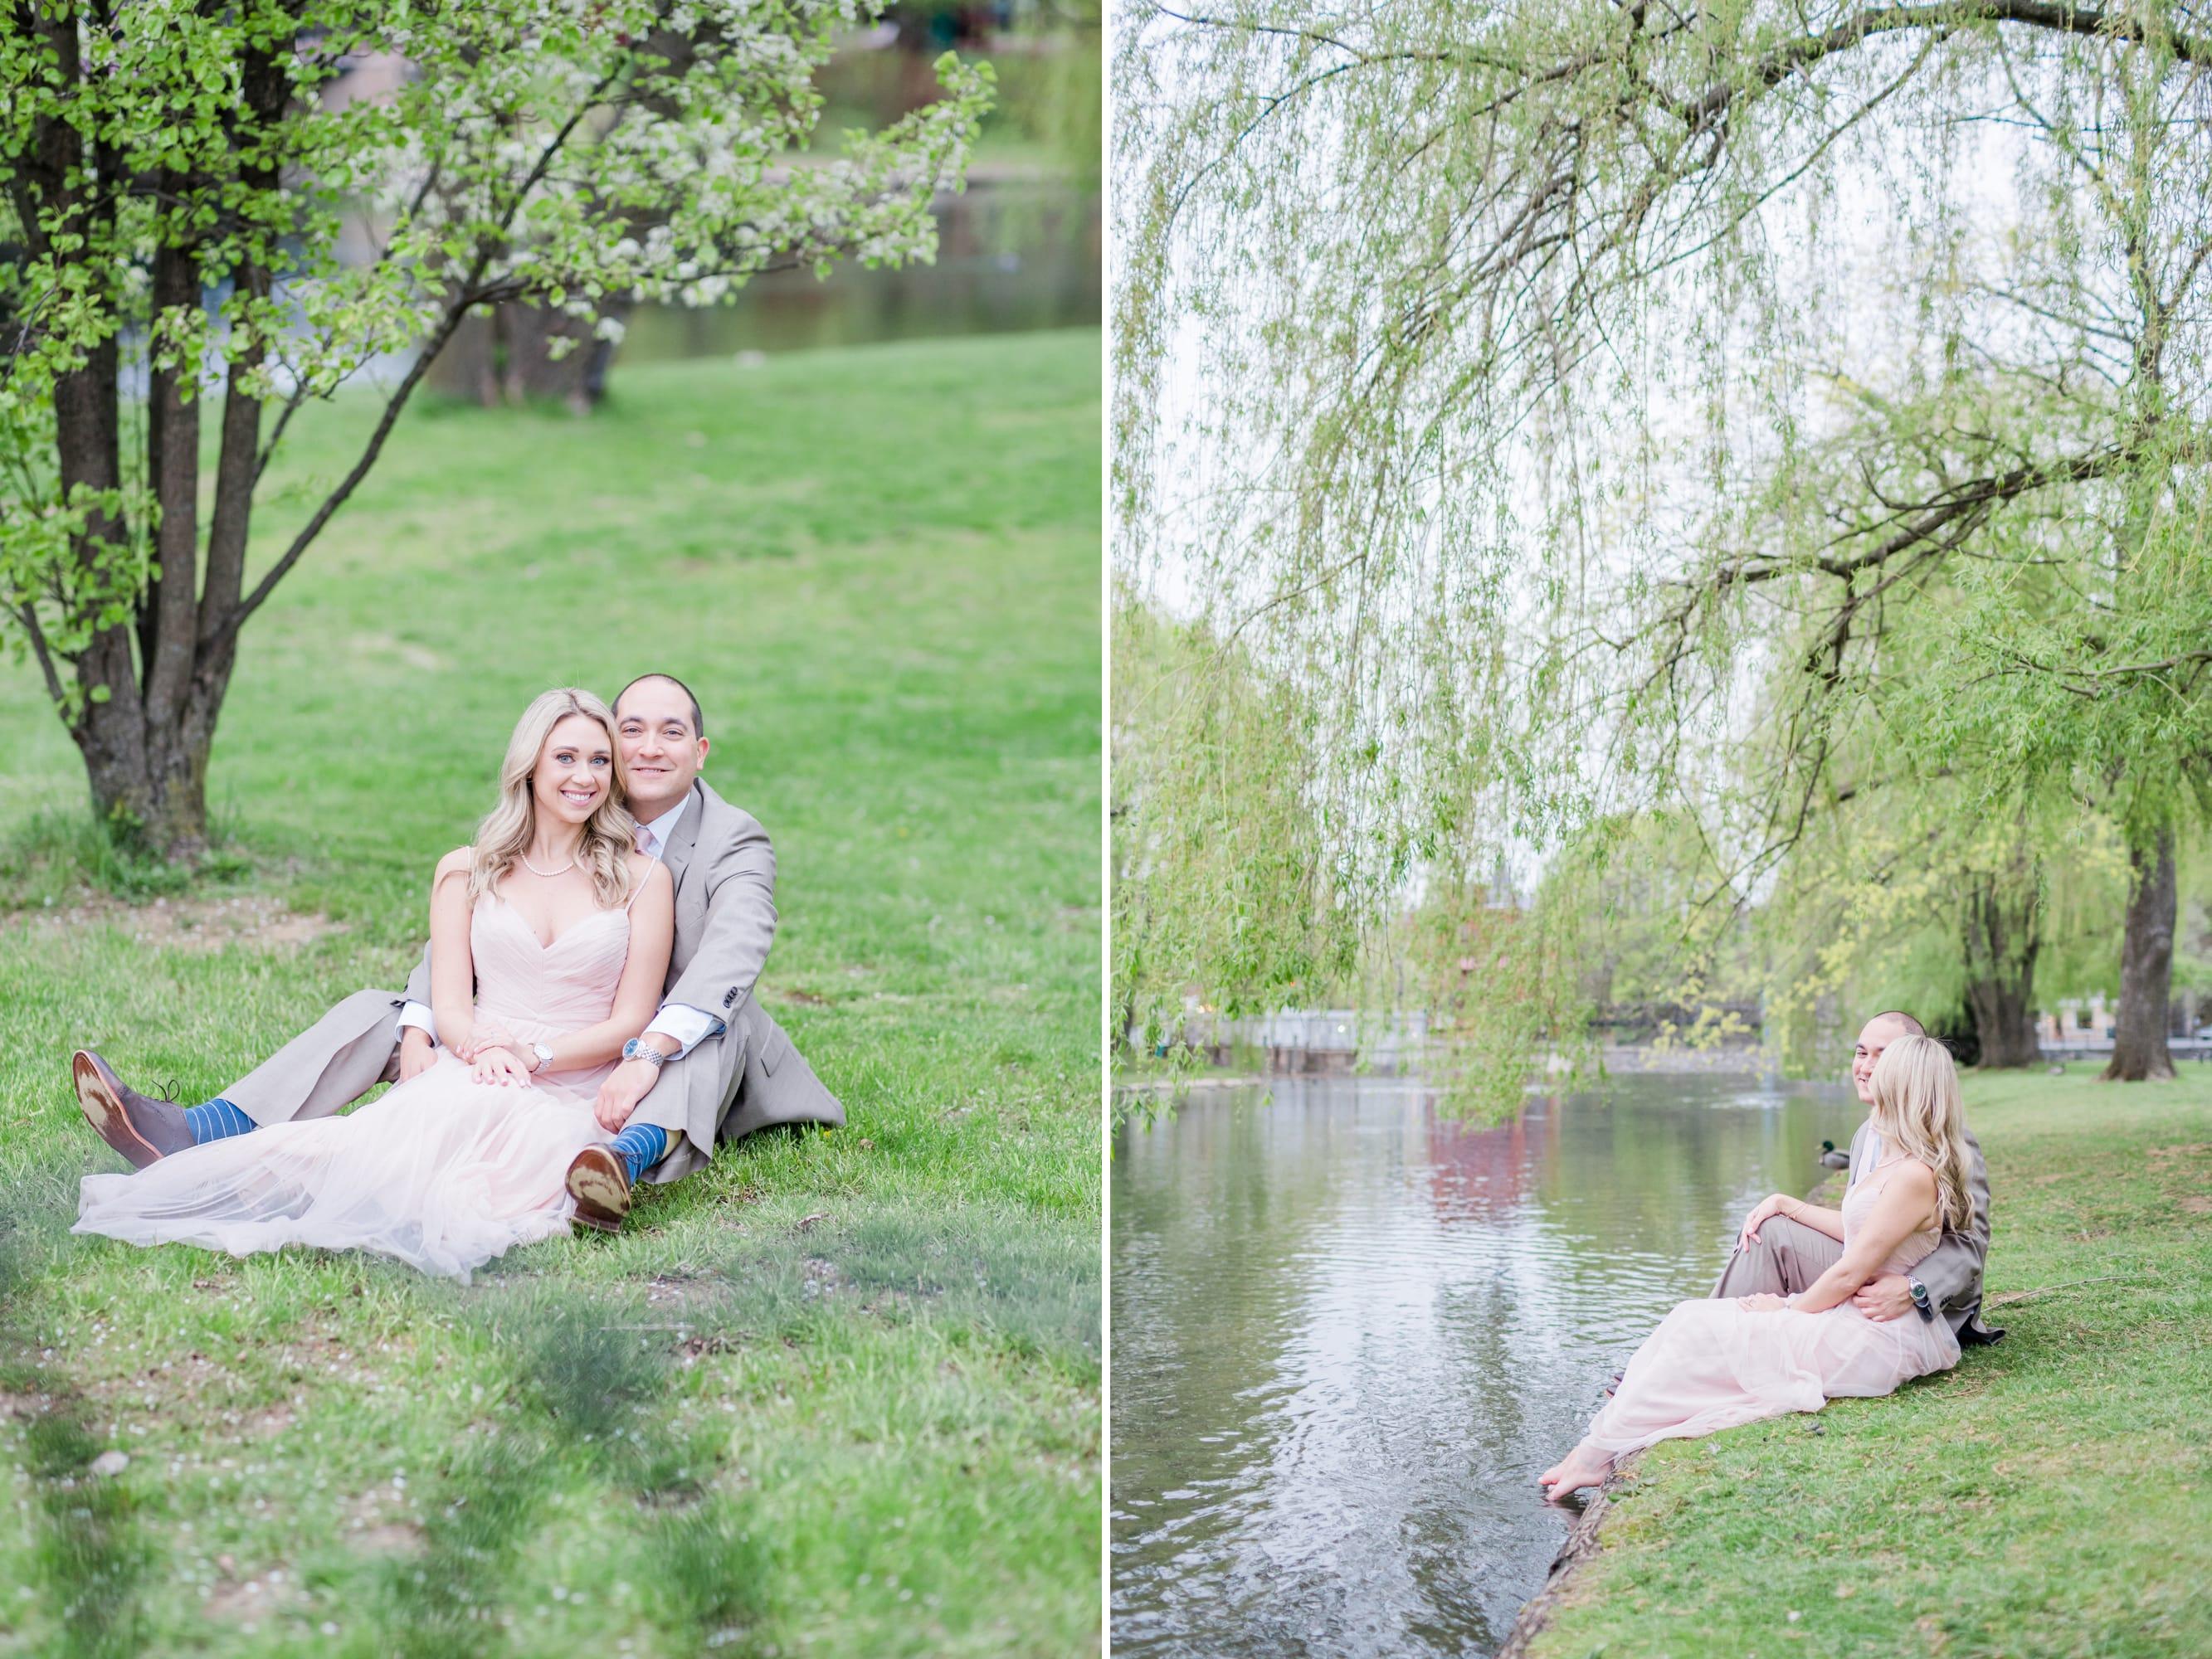 Engagement photos at Talleyrand Park